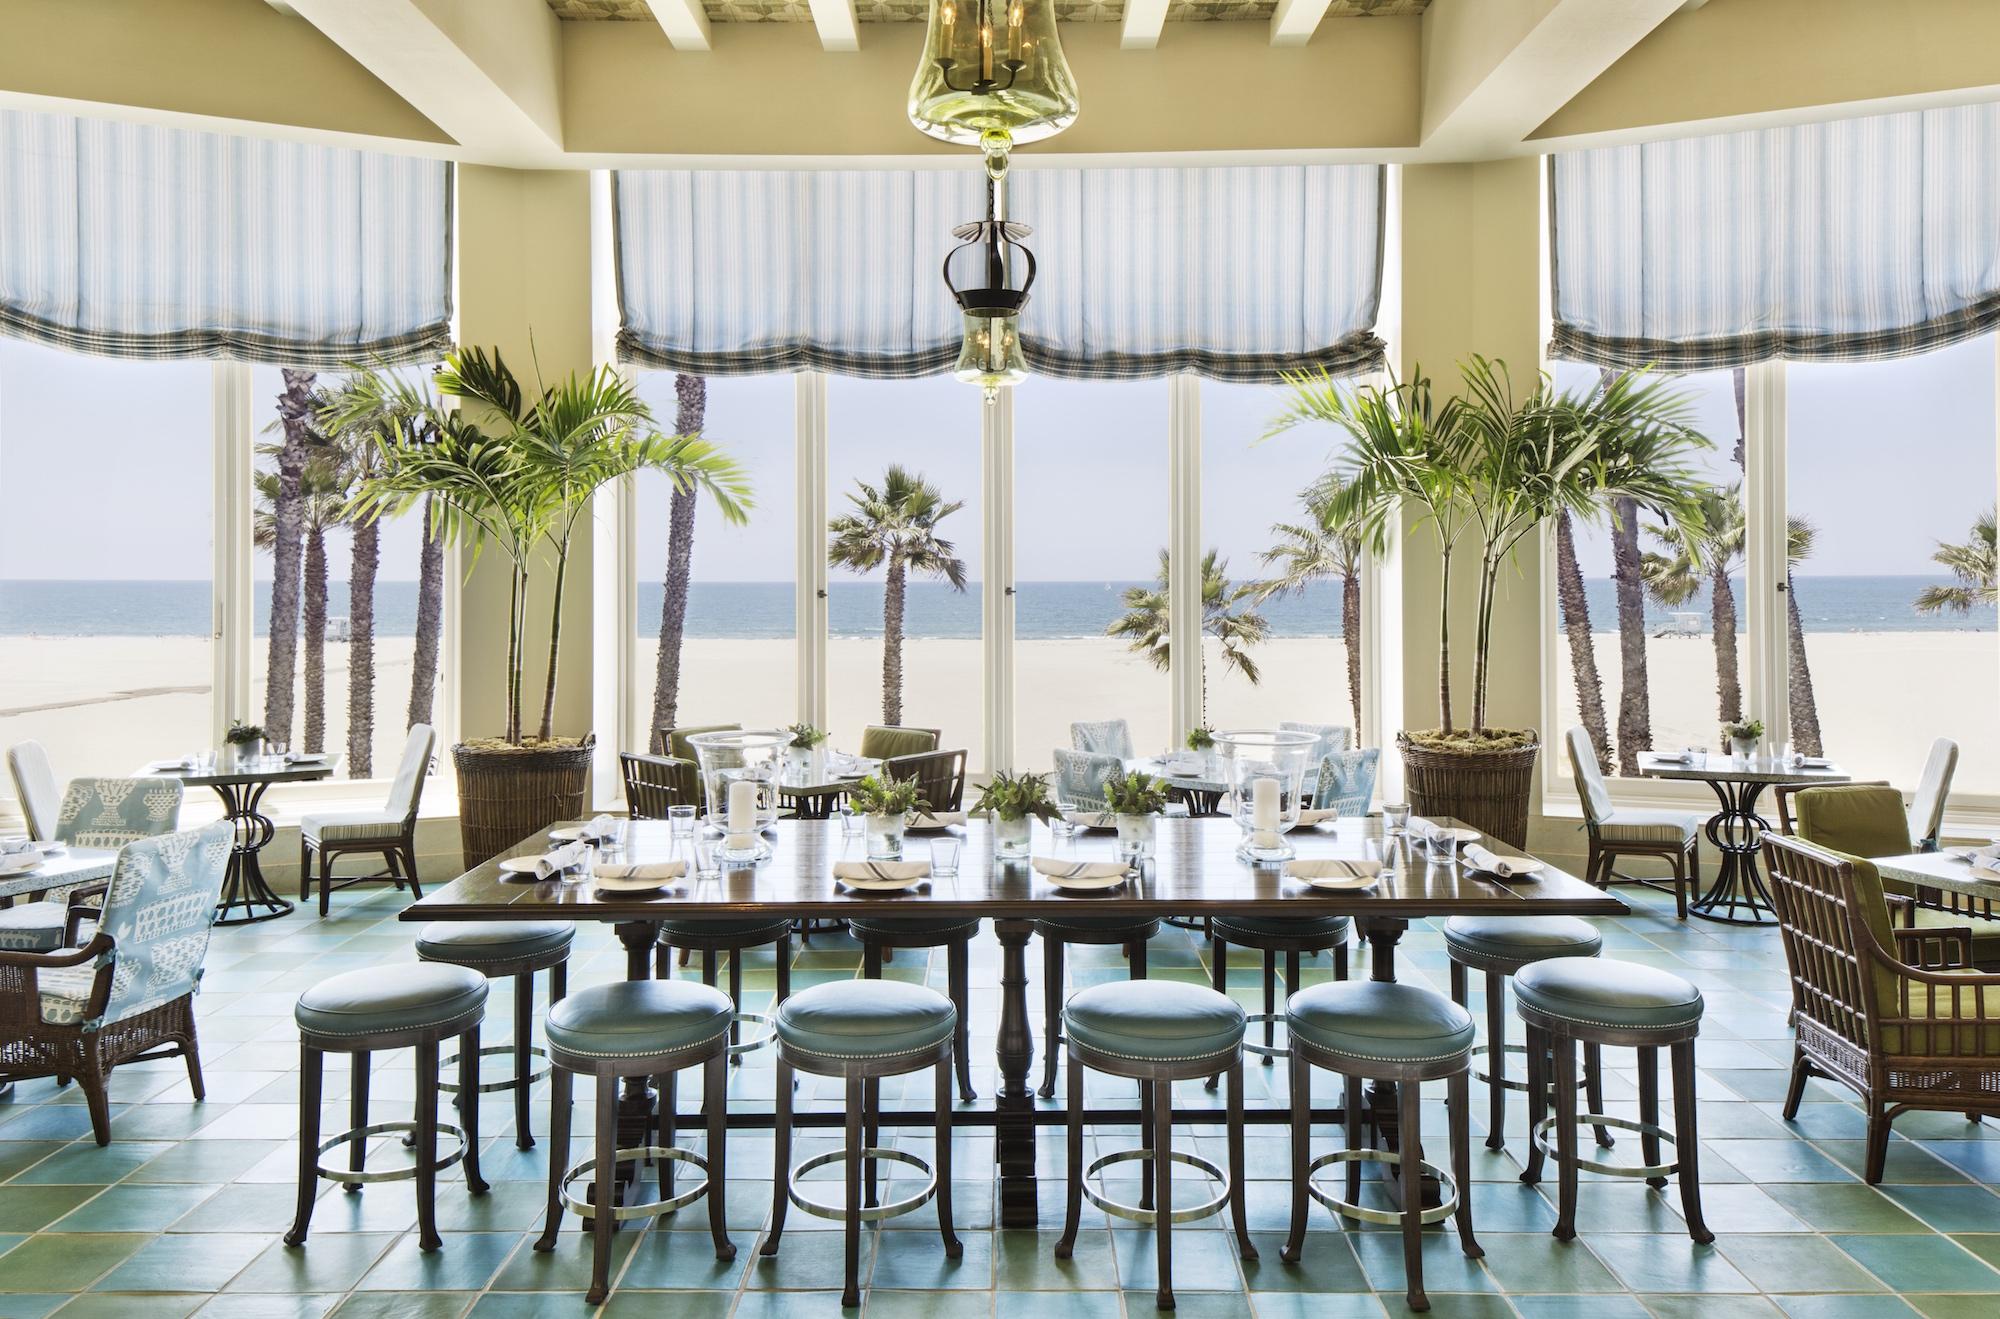 Catch Seafood Restaurant Sushi Santa Monica   LA Fine Dining   Hotel Casa  Del Mar